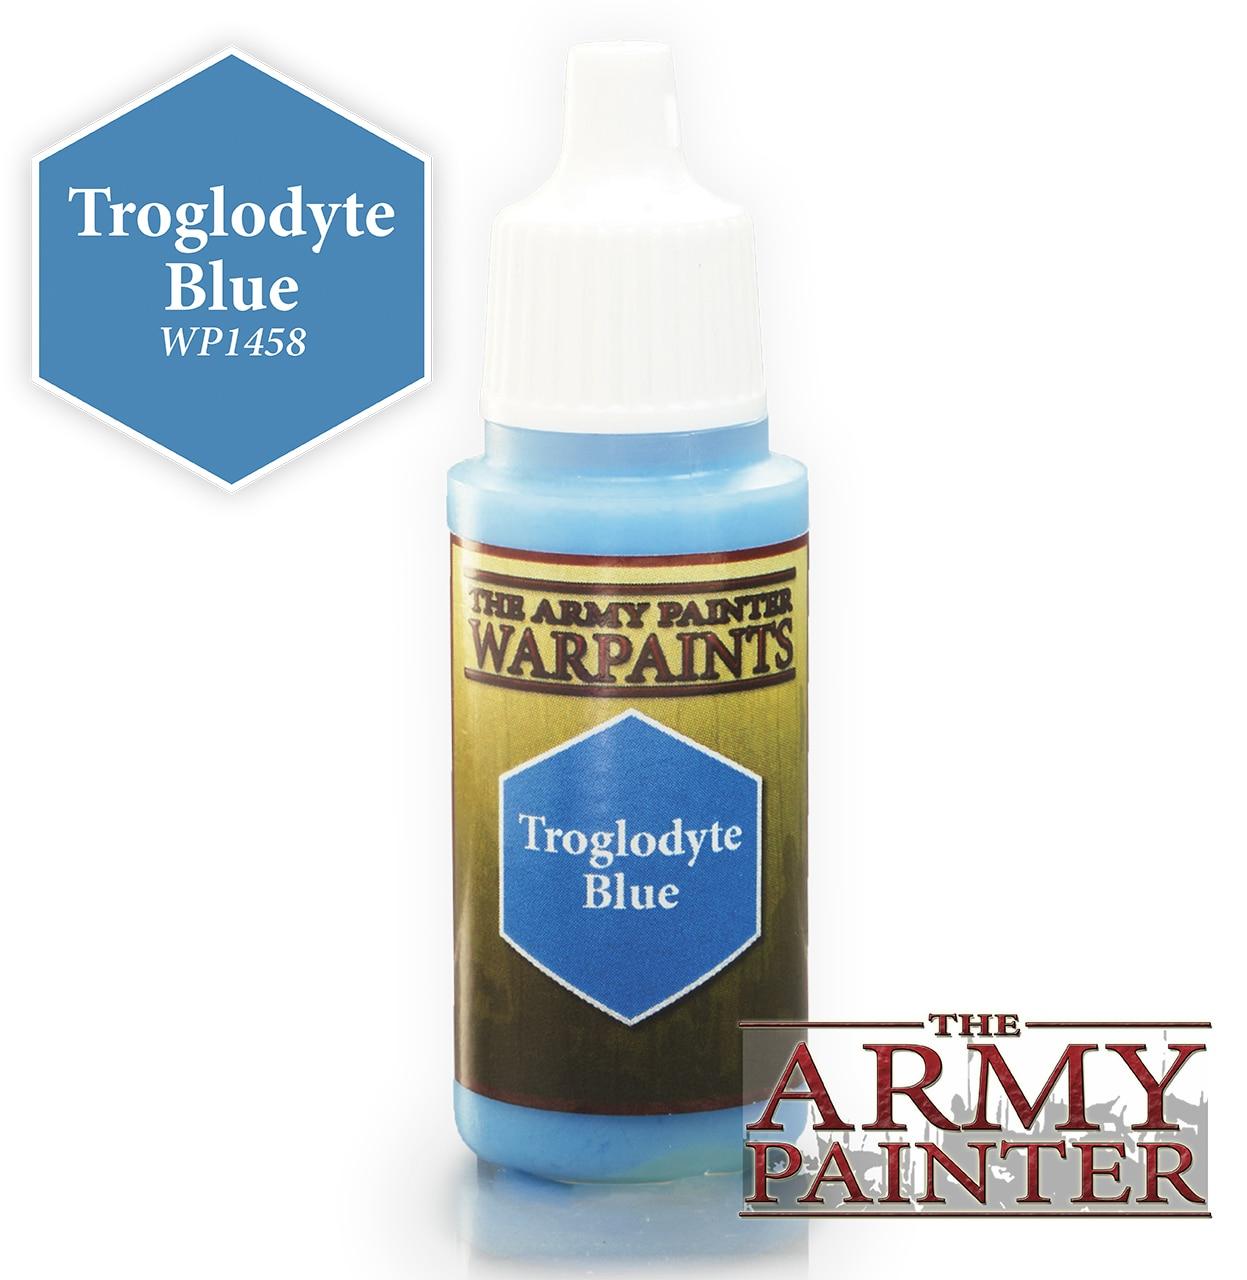 Army Painter Warpaint - Troglodyte Blue